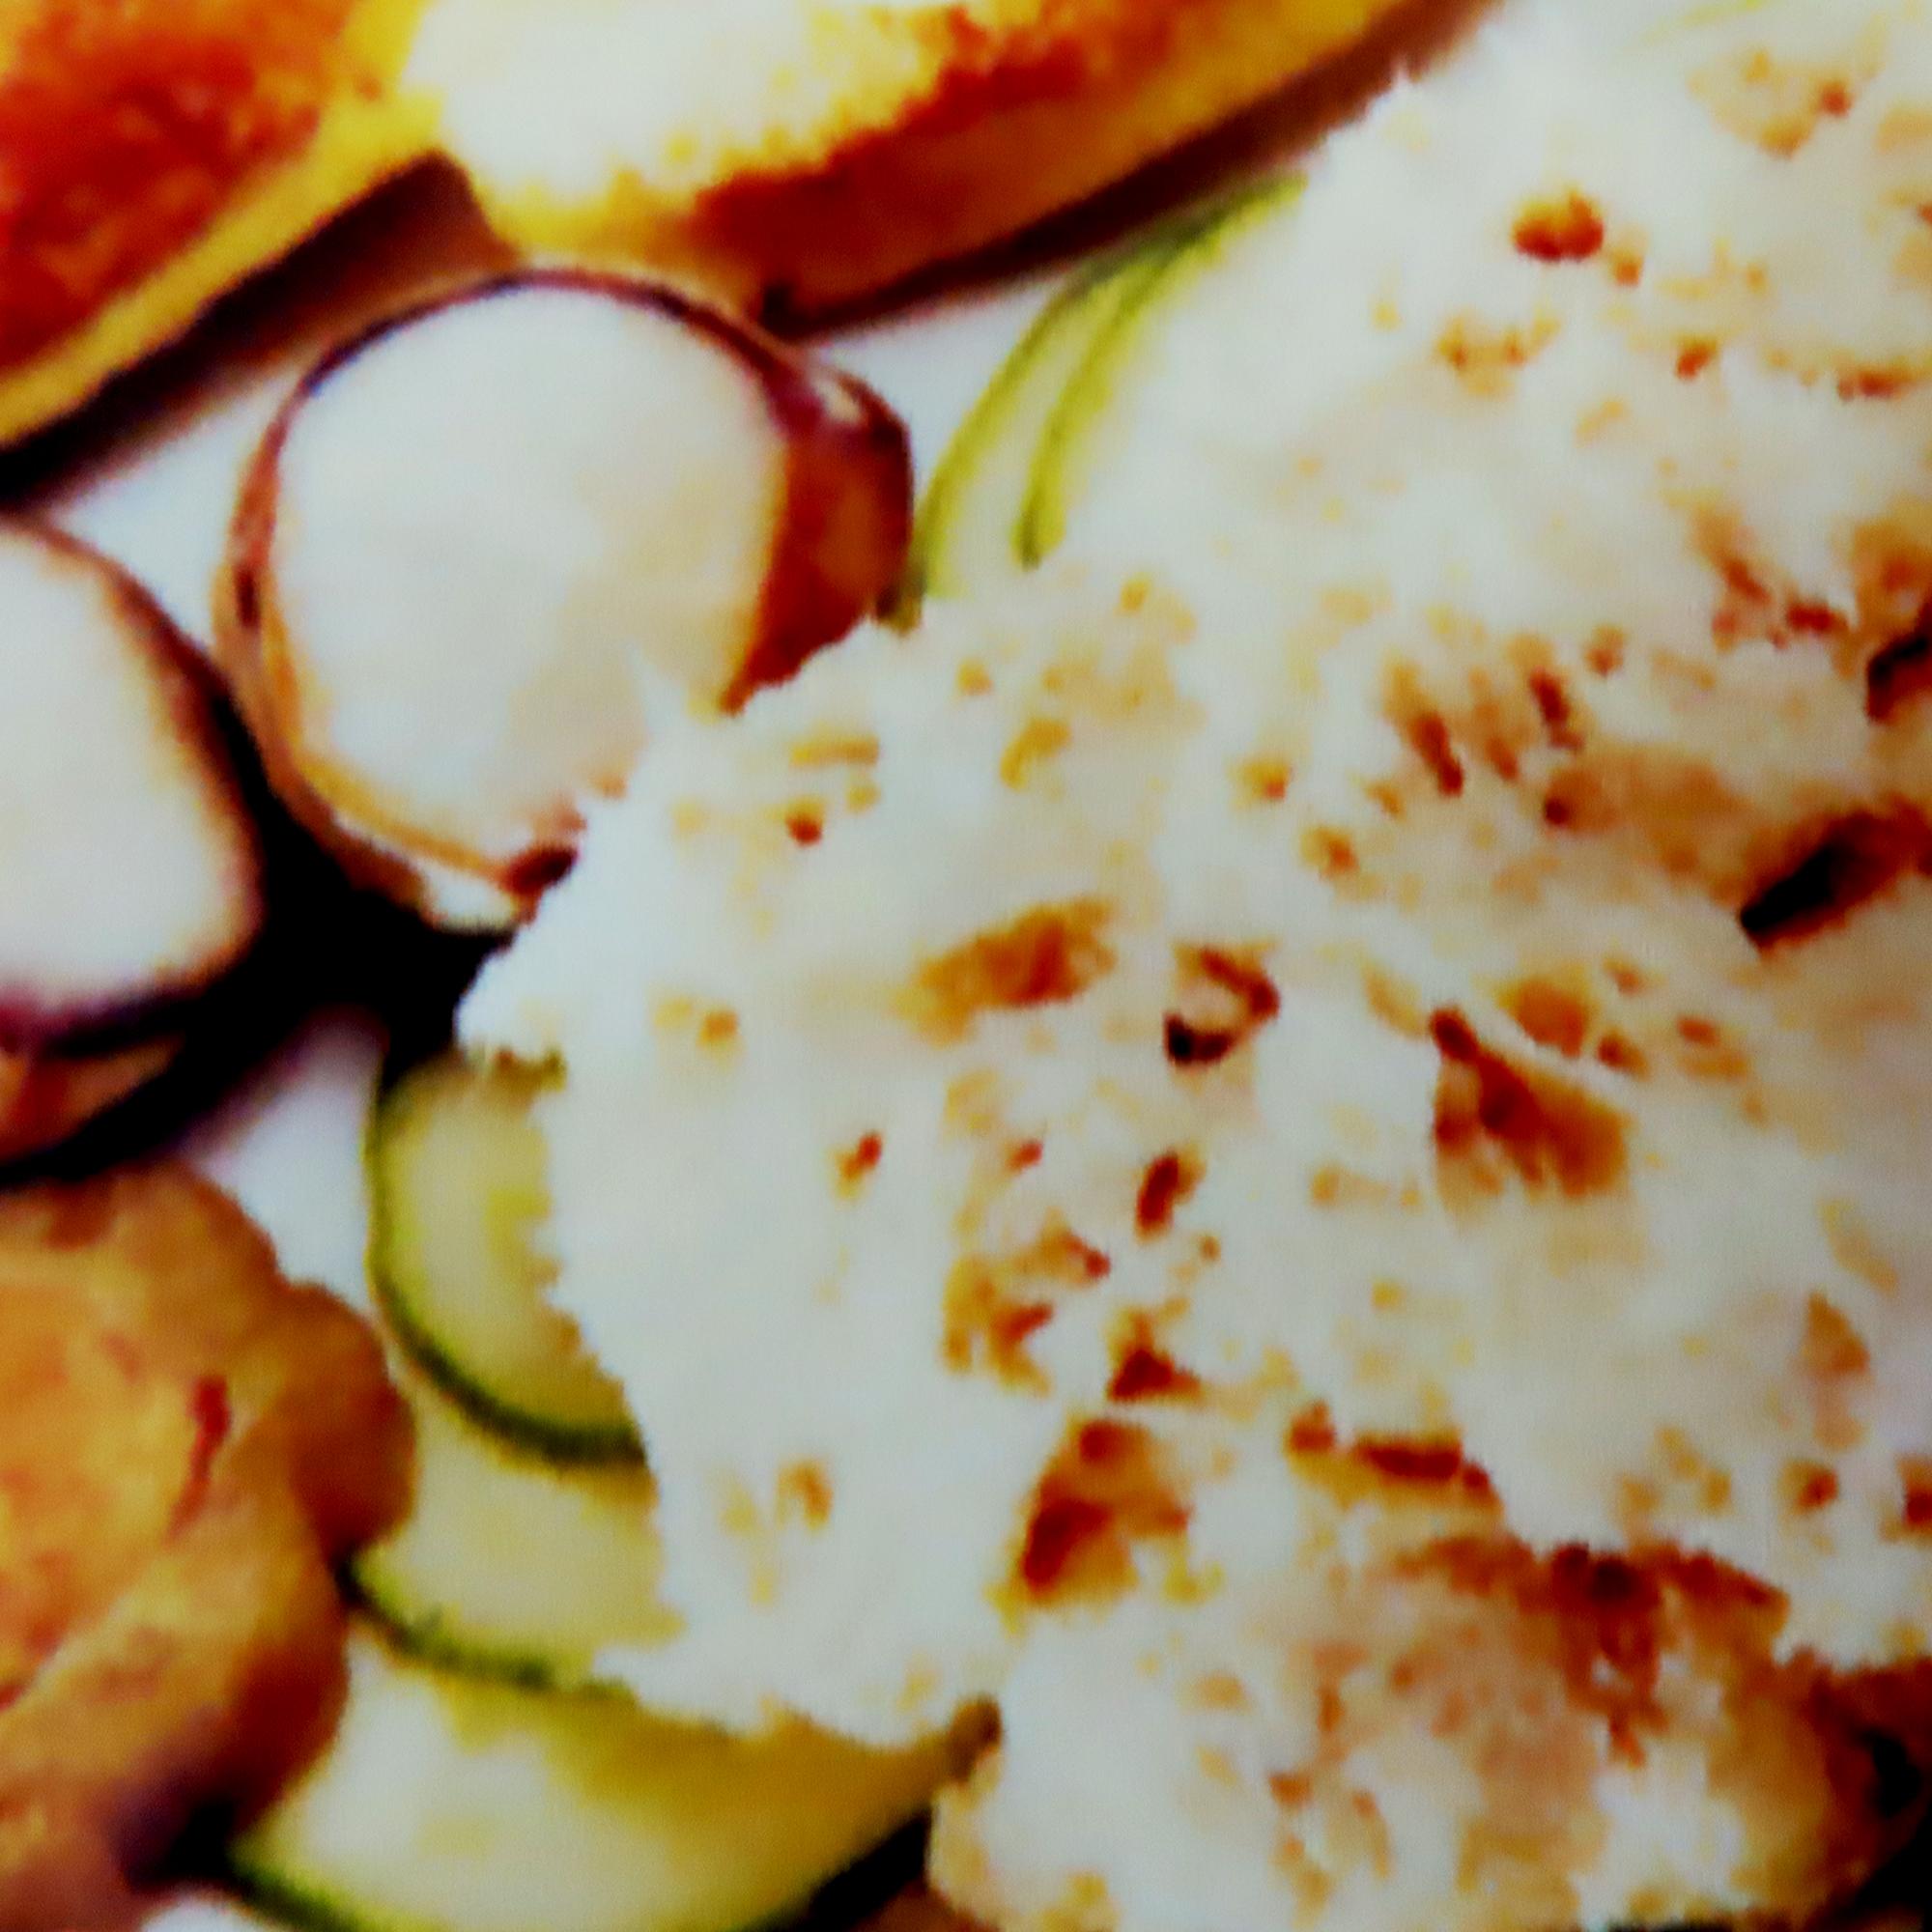 Image Fish Paste 德明 - 素鱼味酱 1000grams